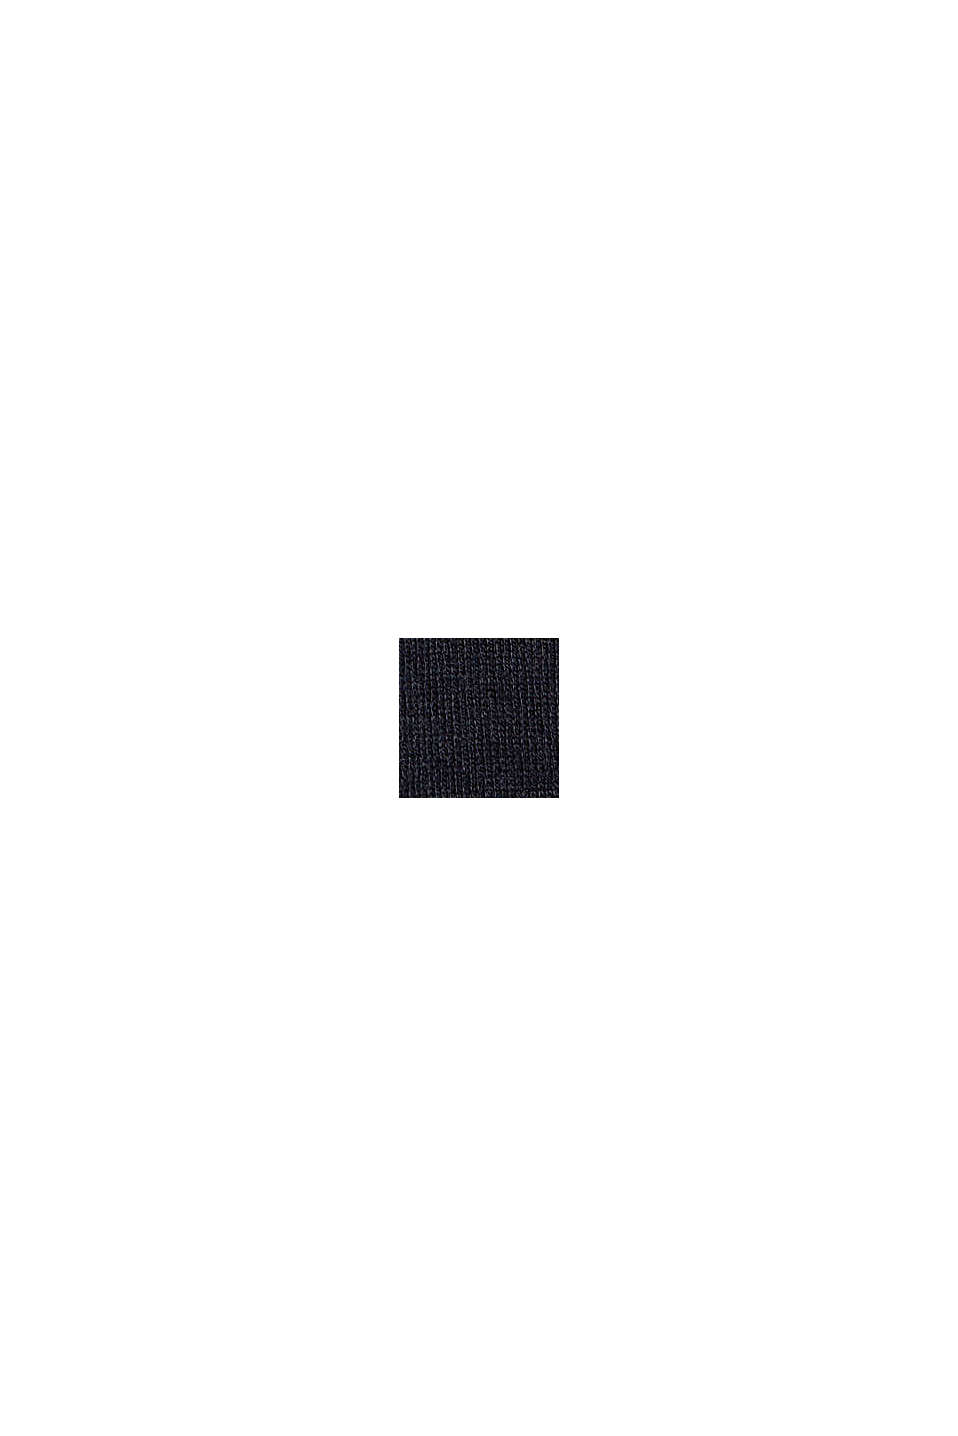 Pull-over en coton bio mélangé, BLACK, swatch